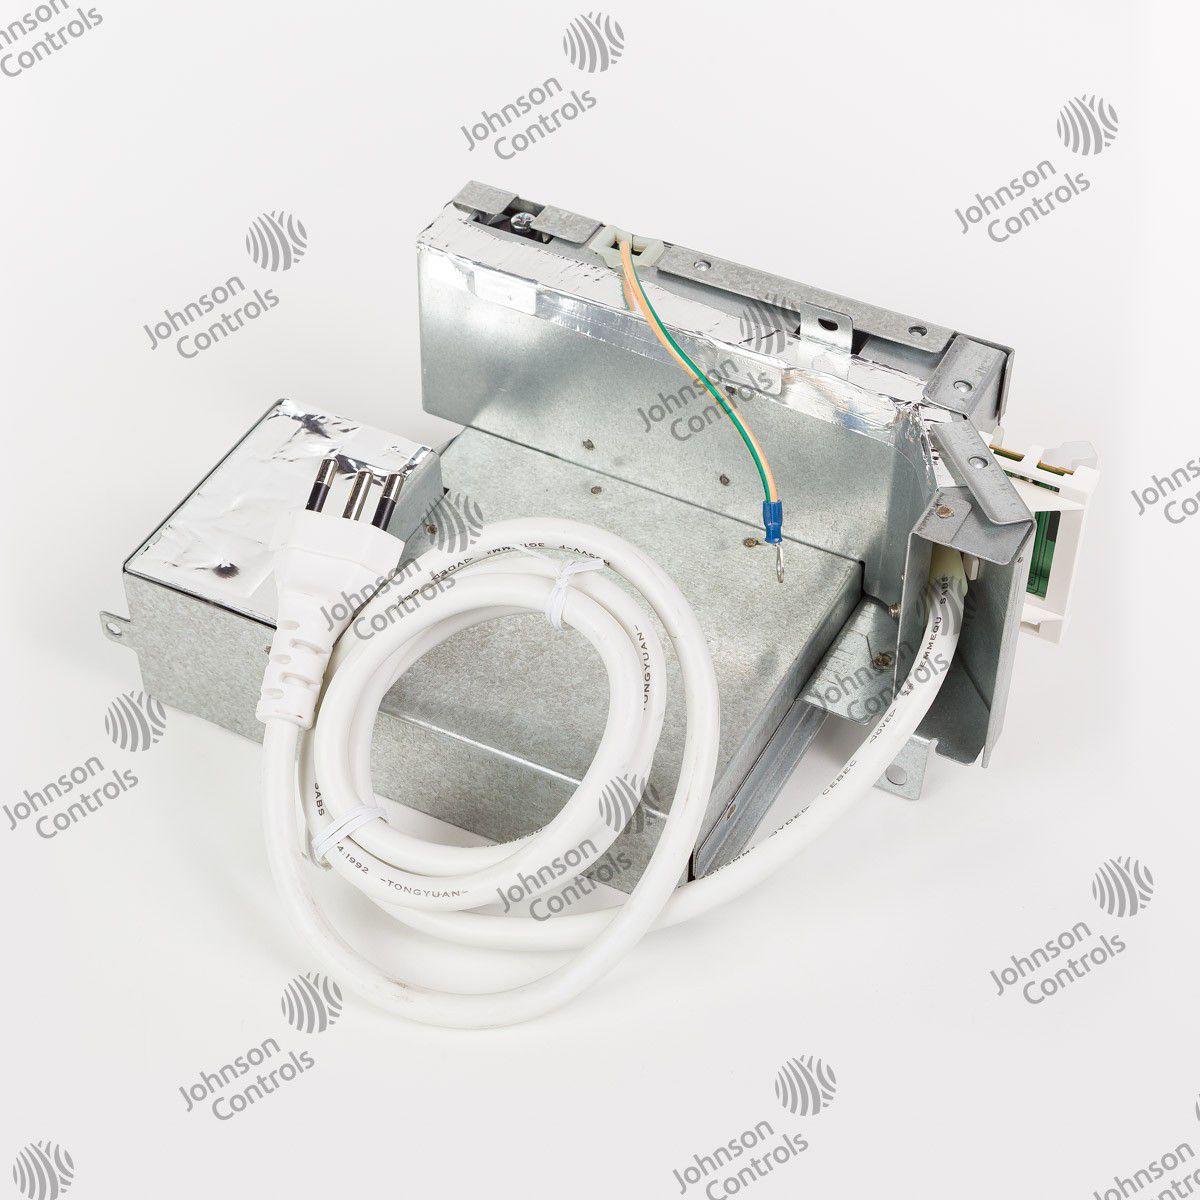 PLACA PRINCIPAL - H1201SKM001